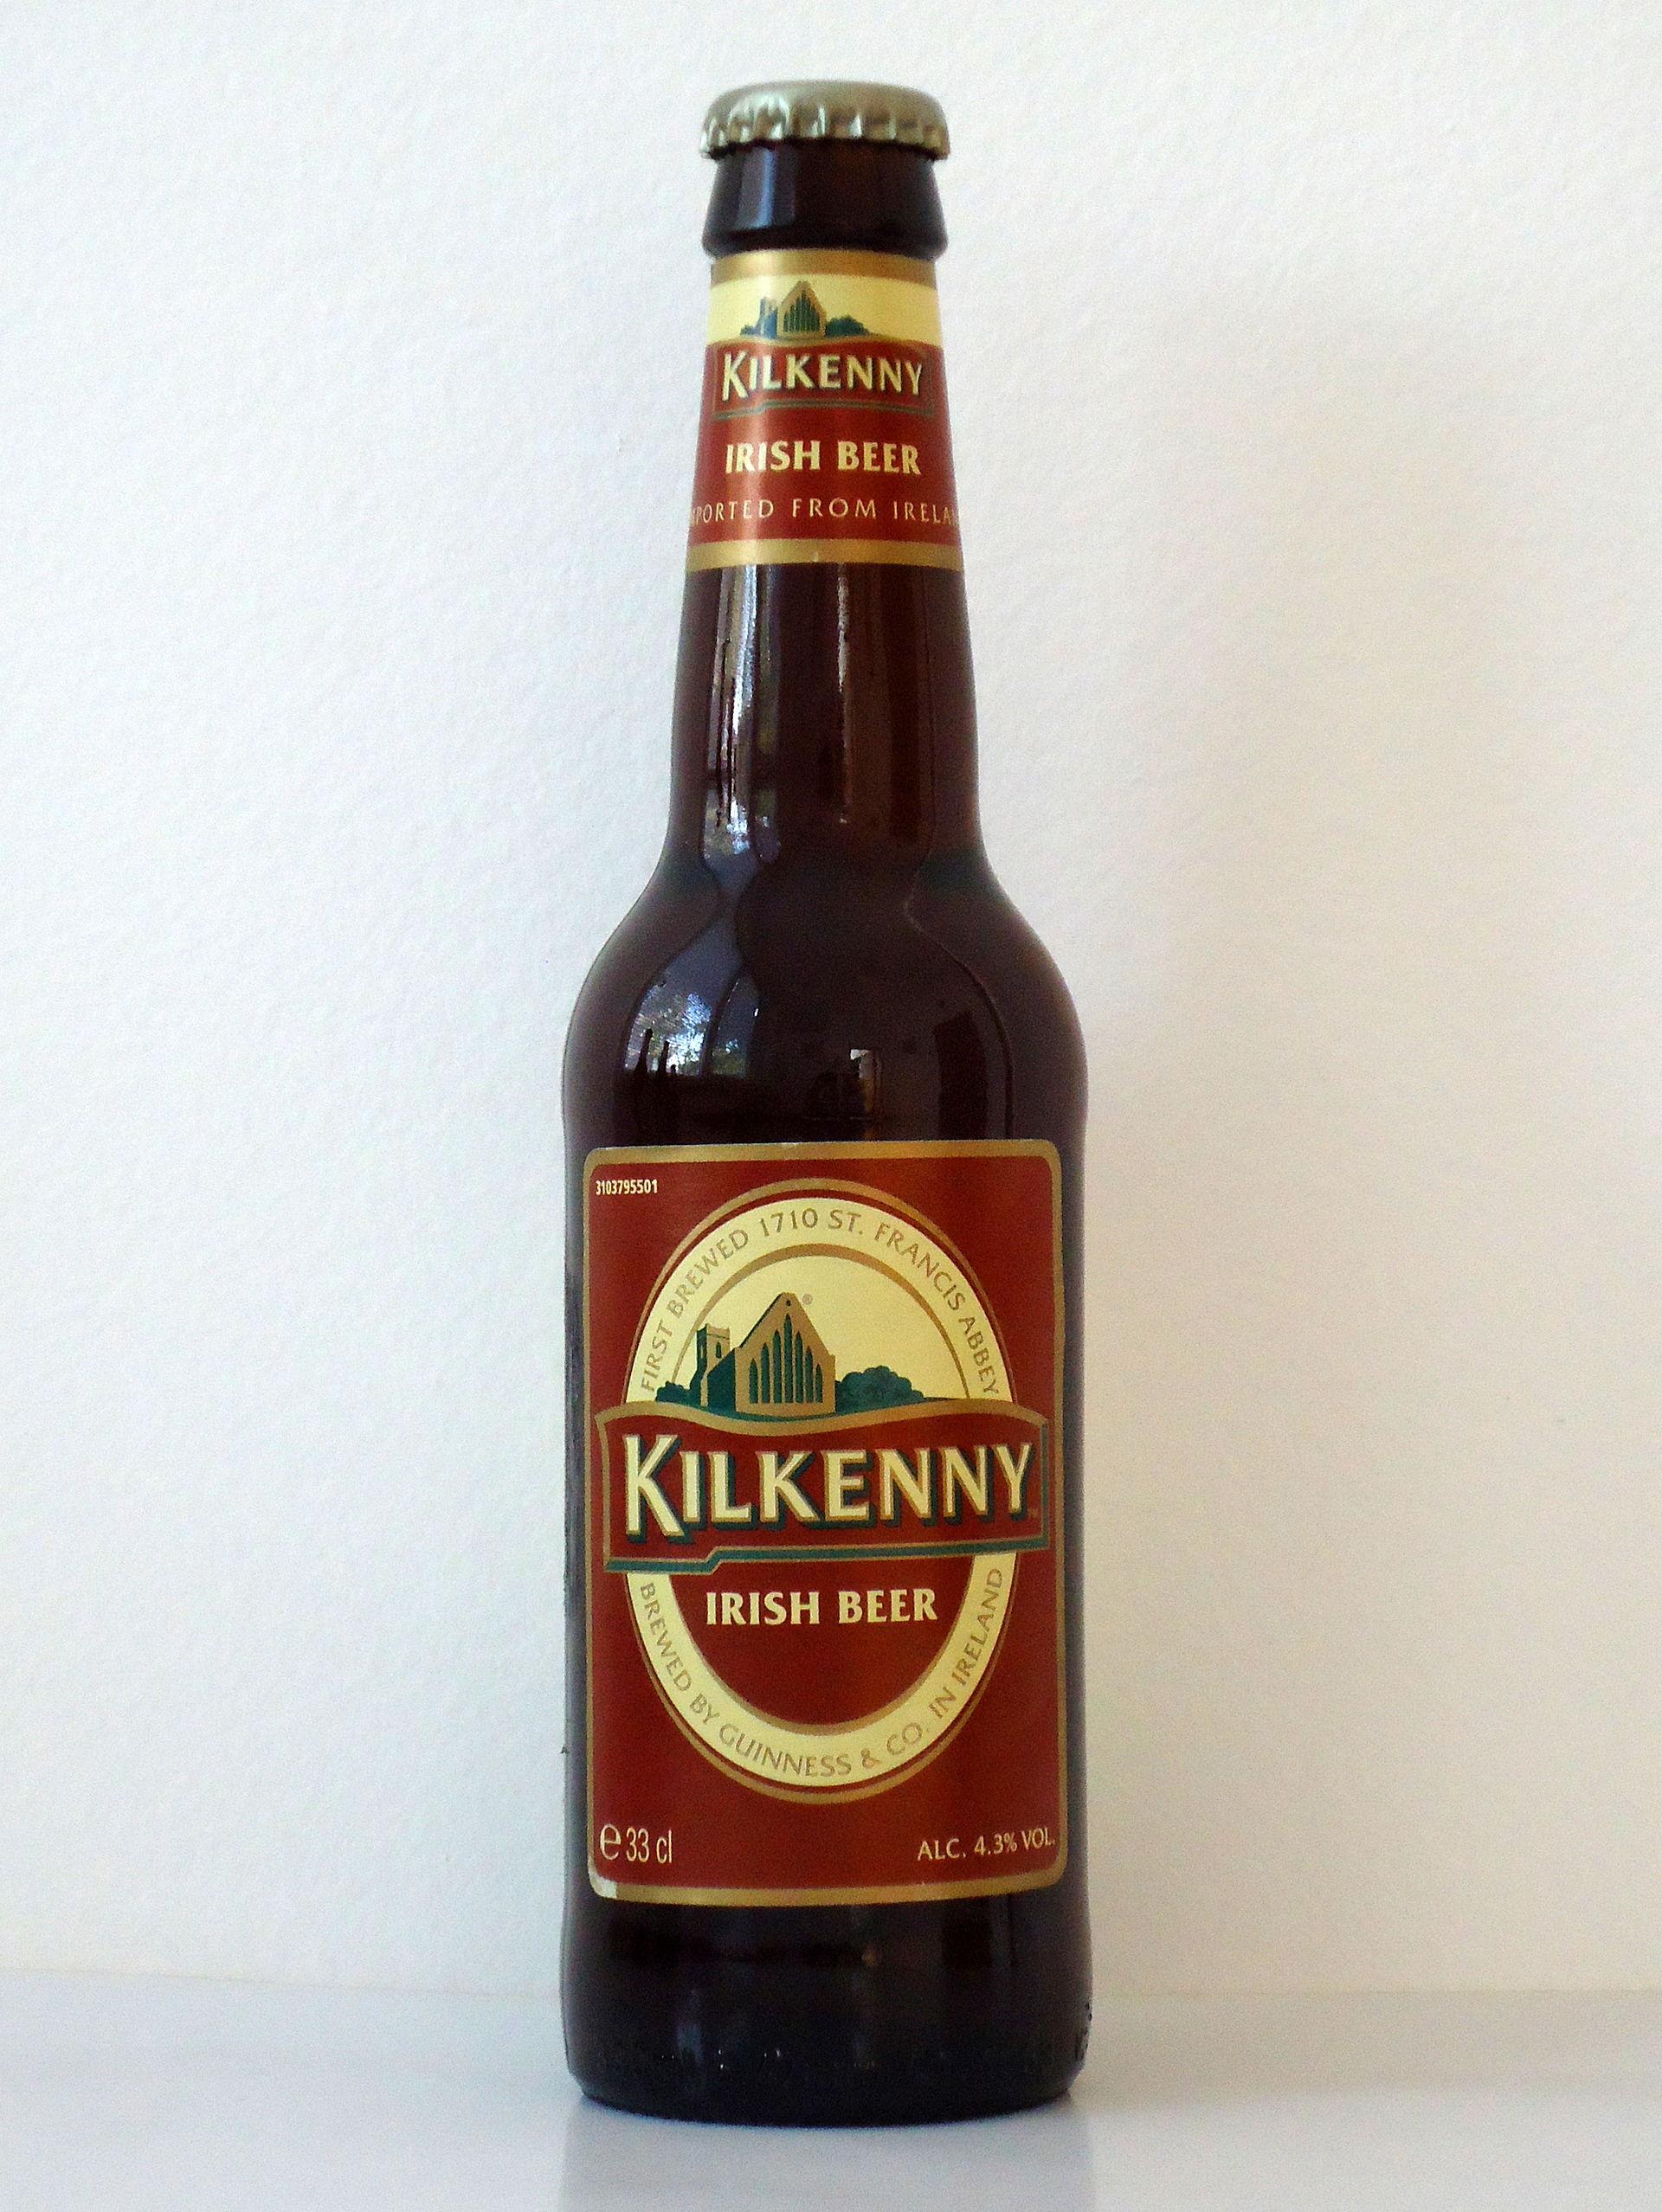 Kilkenny beer wikipedia for Guinness beer in ireland